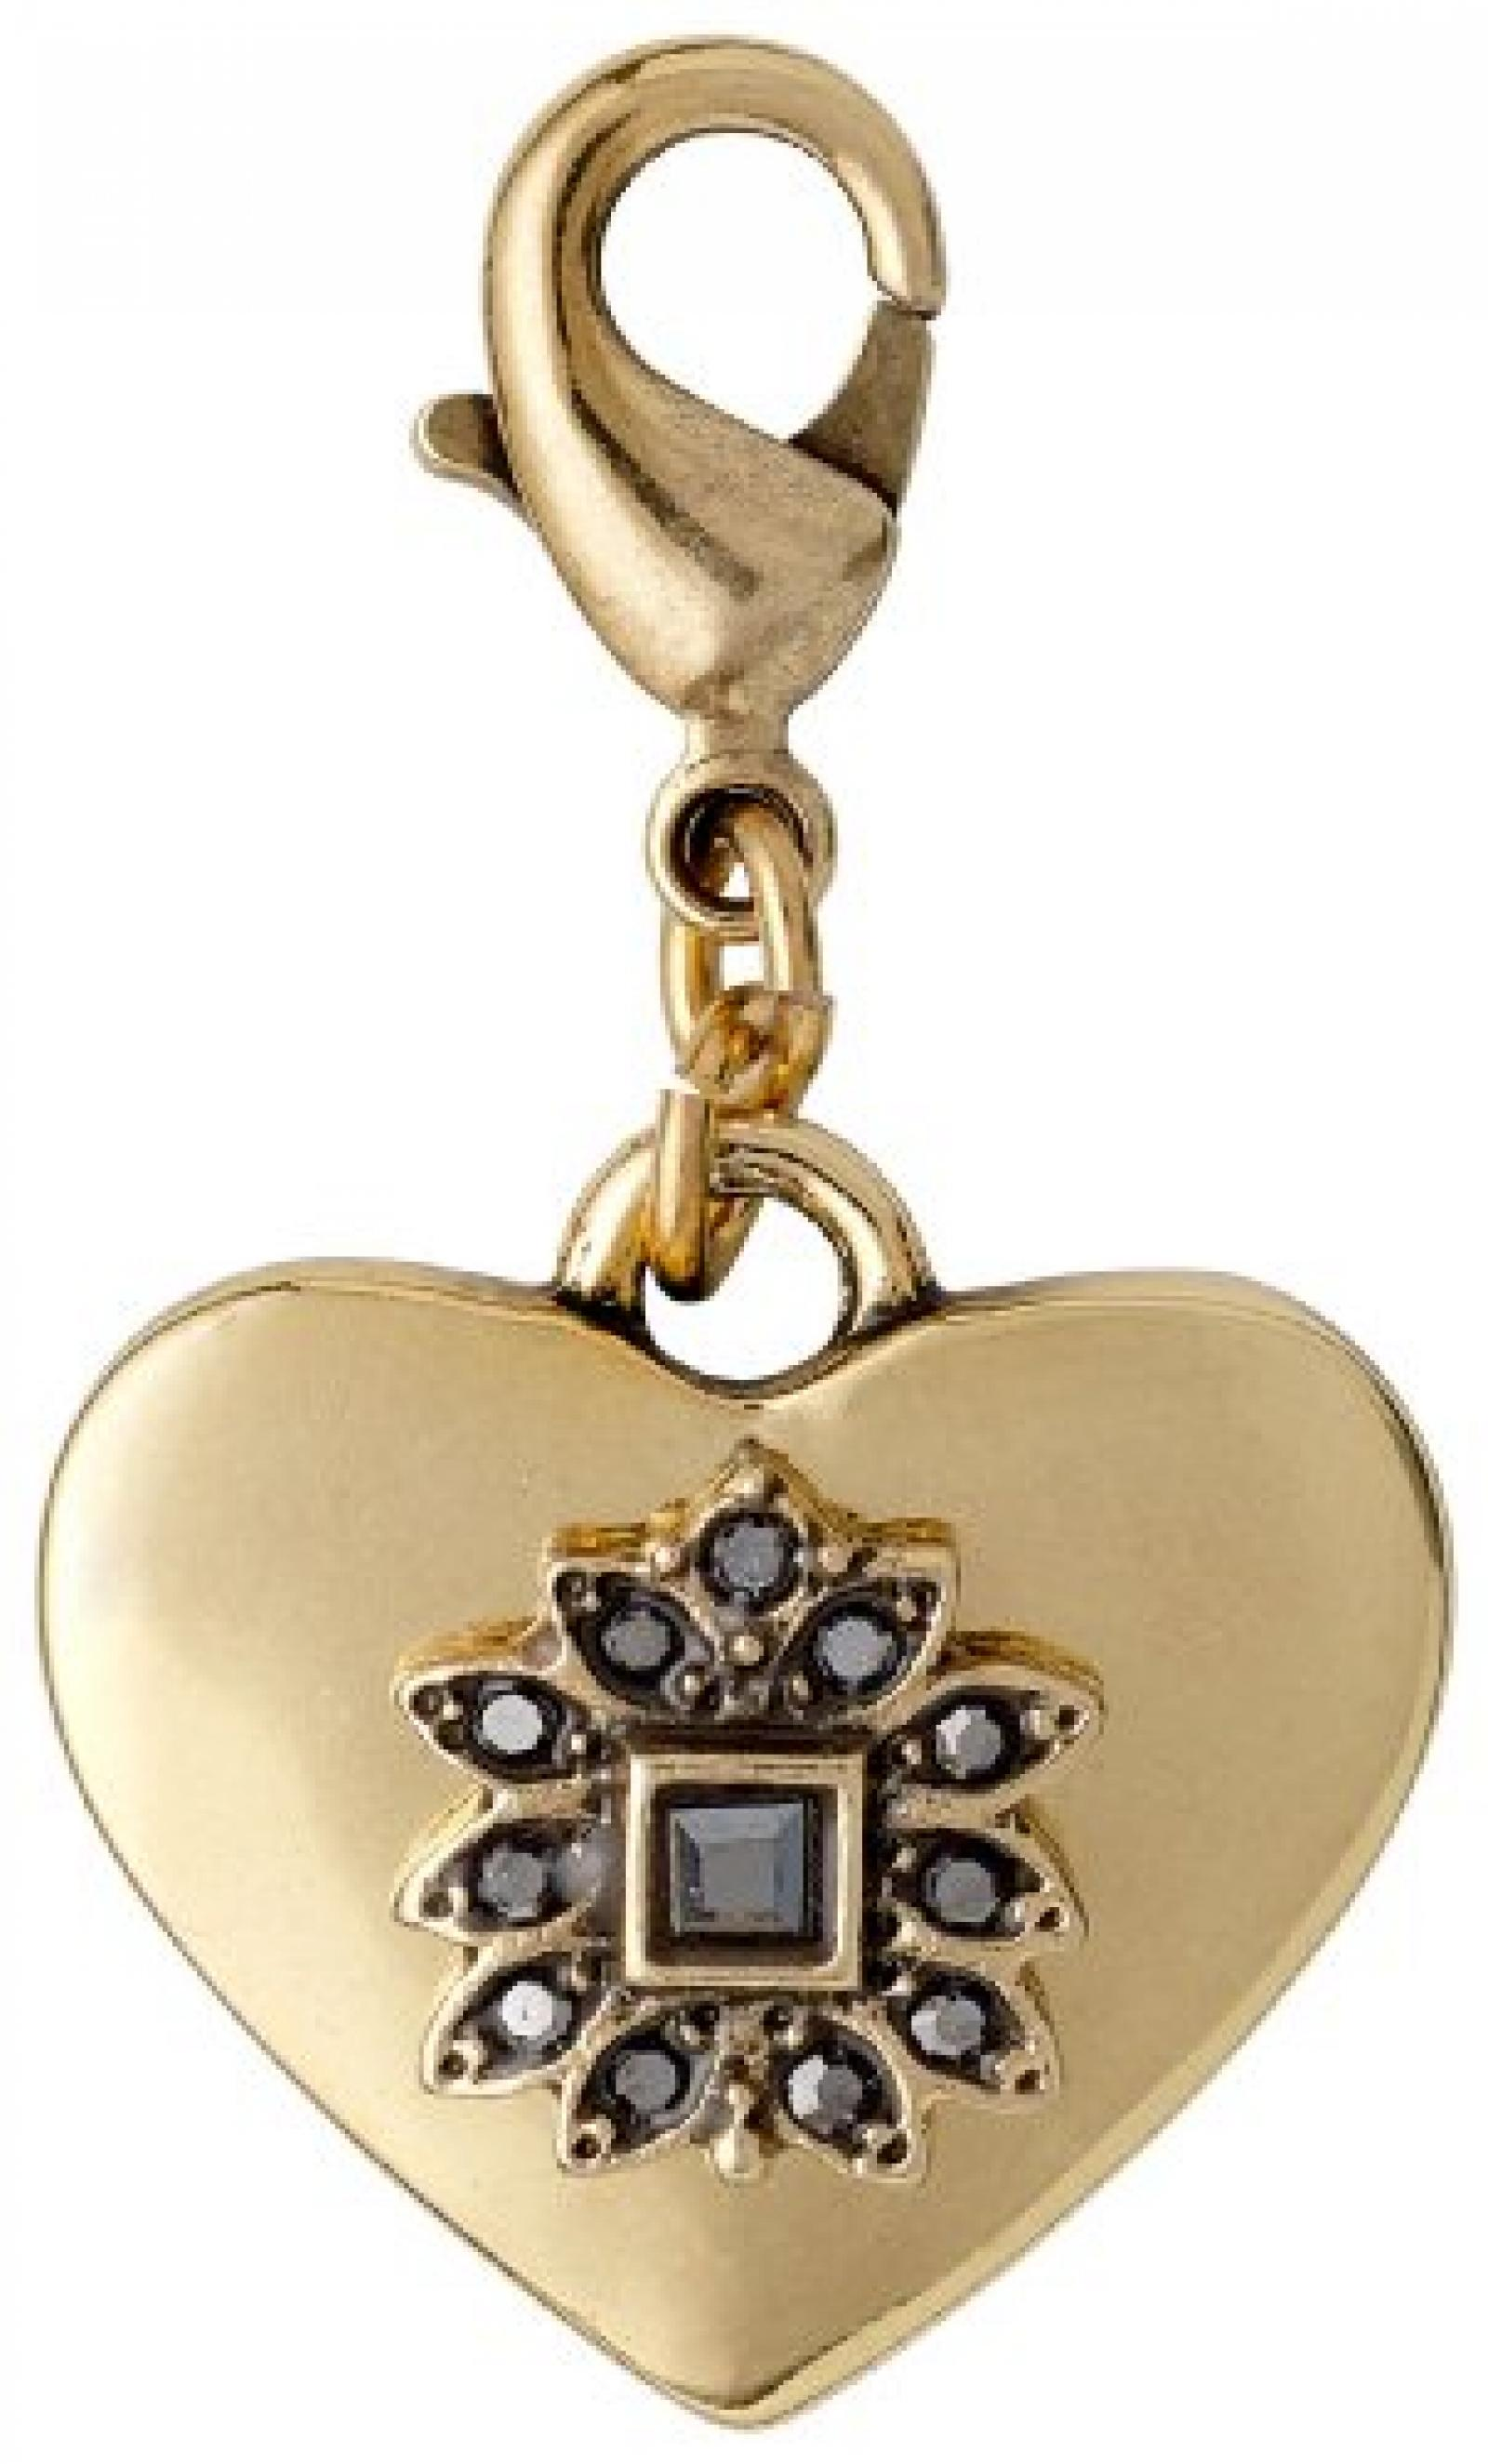 Pilgrim Jewelry Damen-Anhänger Messing Kristall Charms Vergoldet 3.3 cm grau 401342103